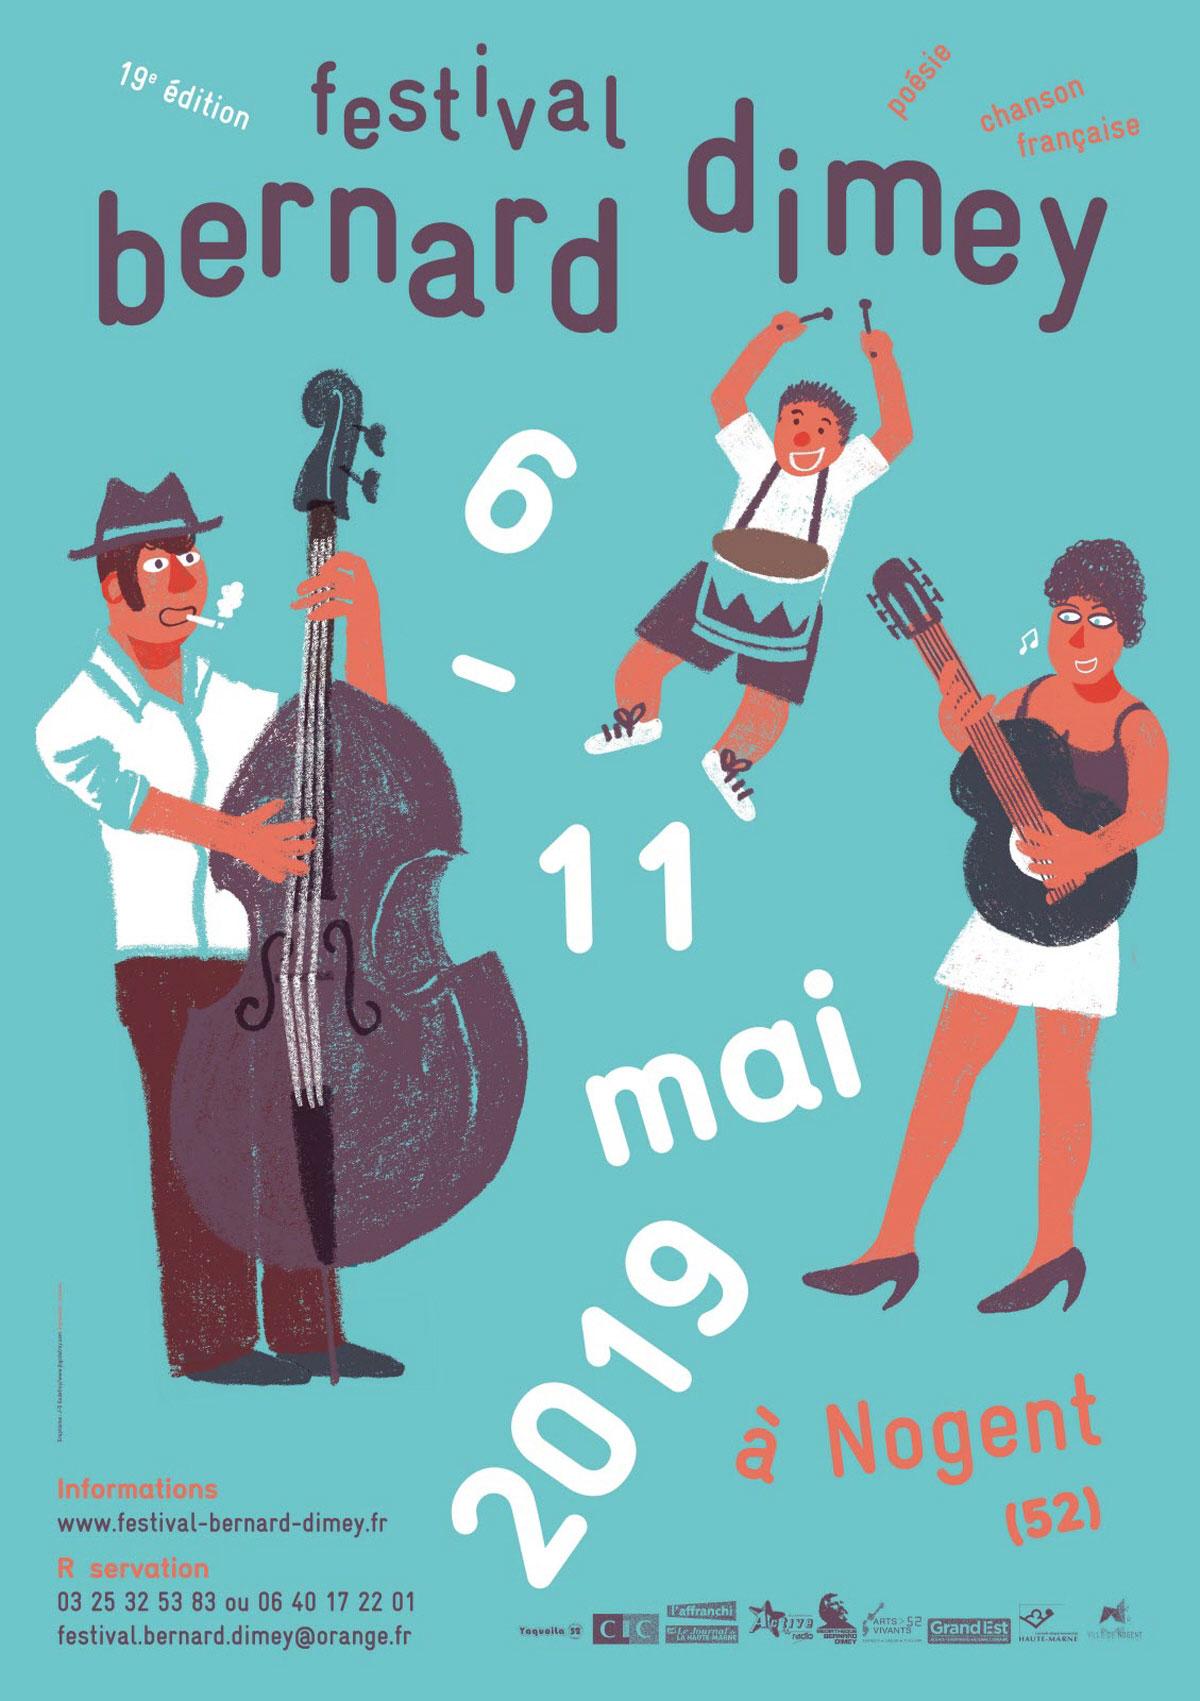 Festival Bernard Dimey à Nogent (Haute-Marne) du 6 au 11 mai 2019